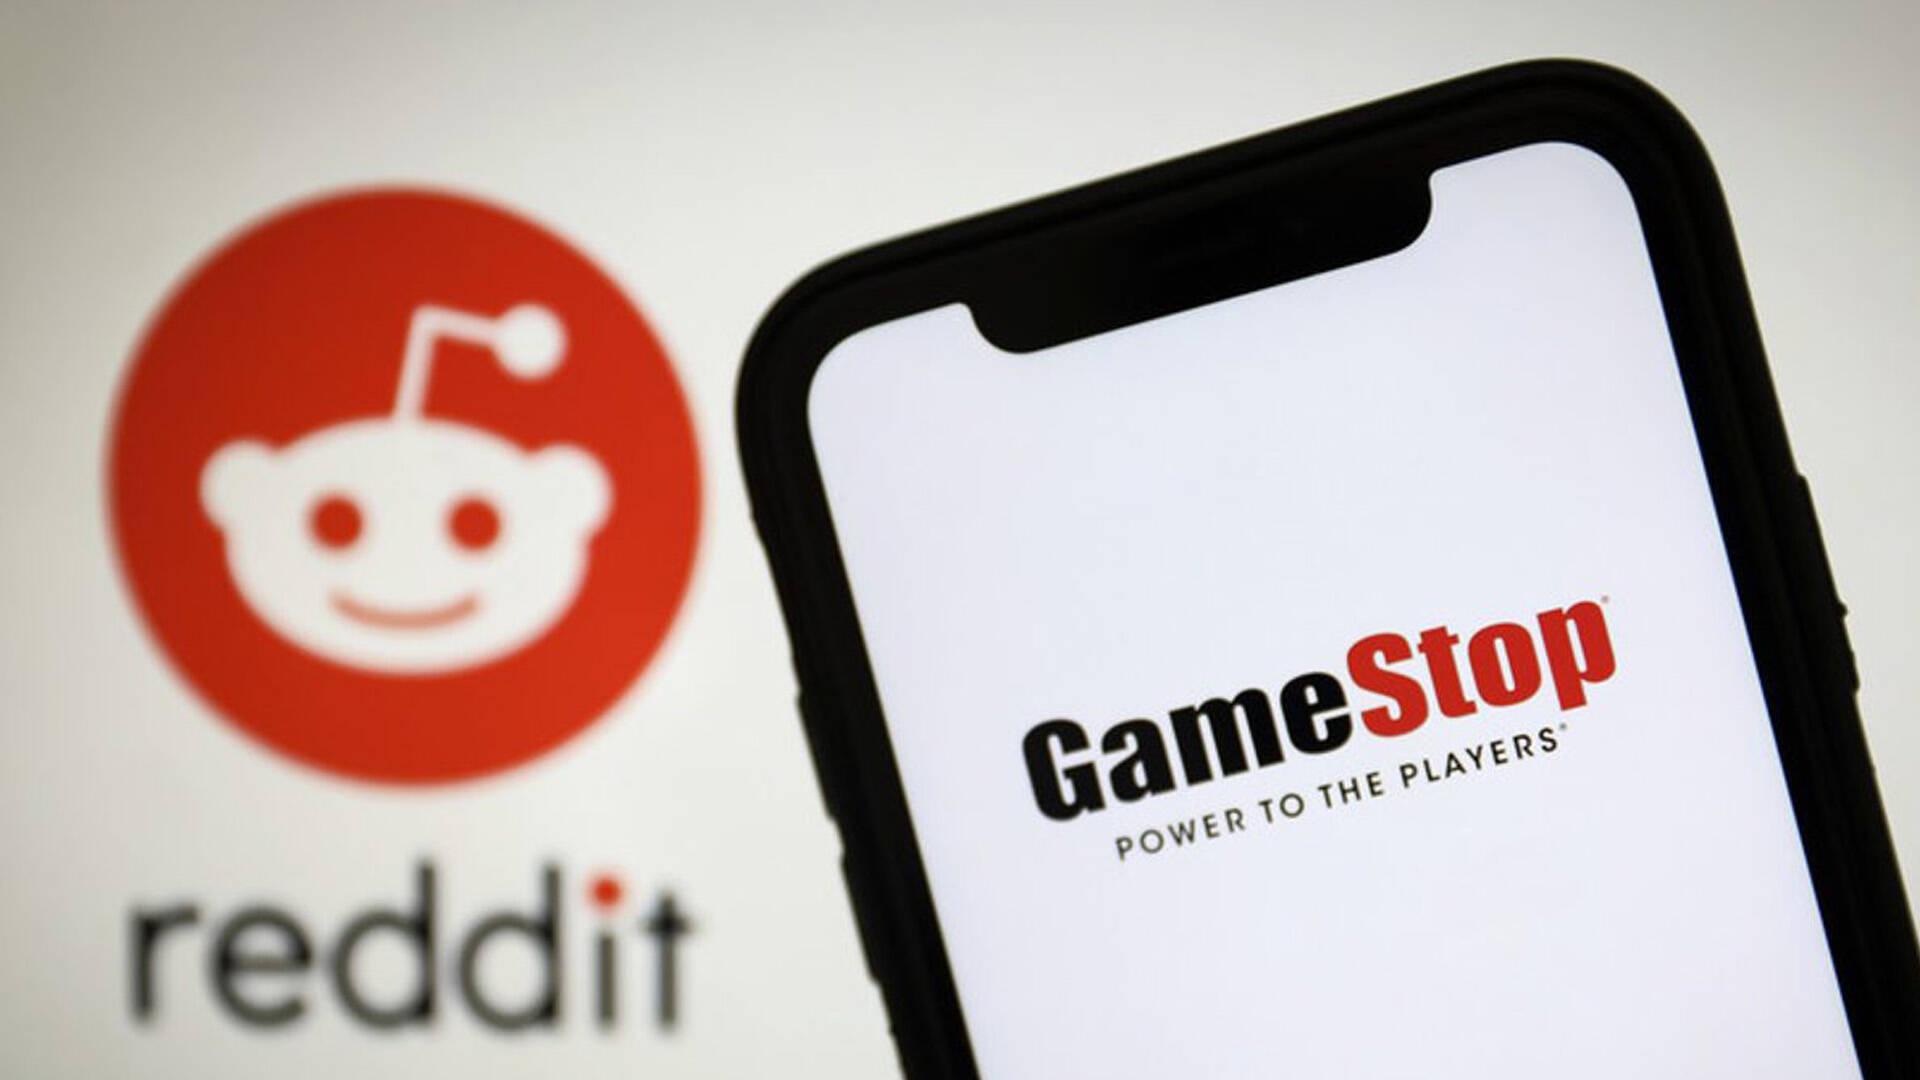 Gamestop Reddit